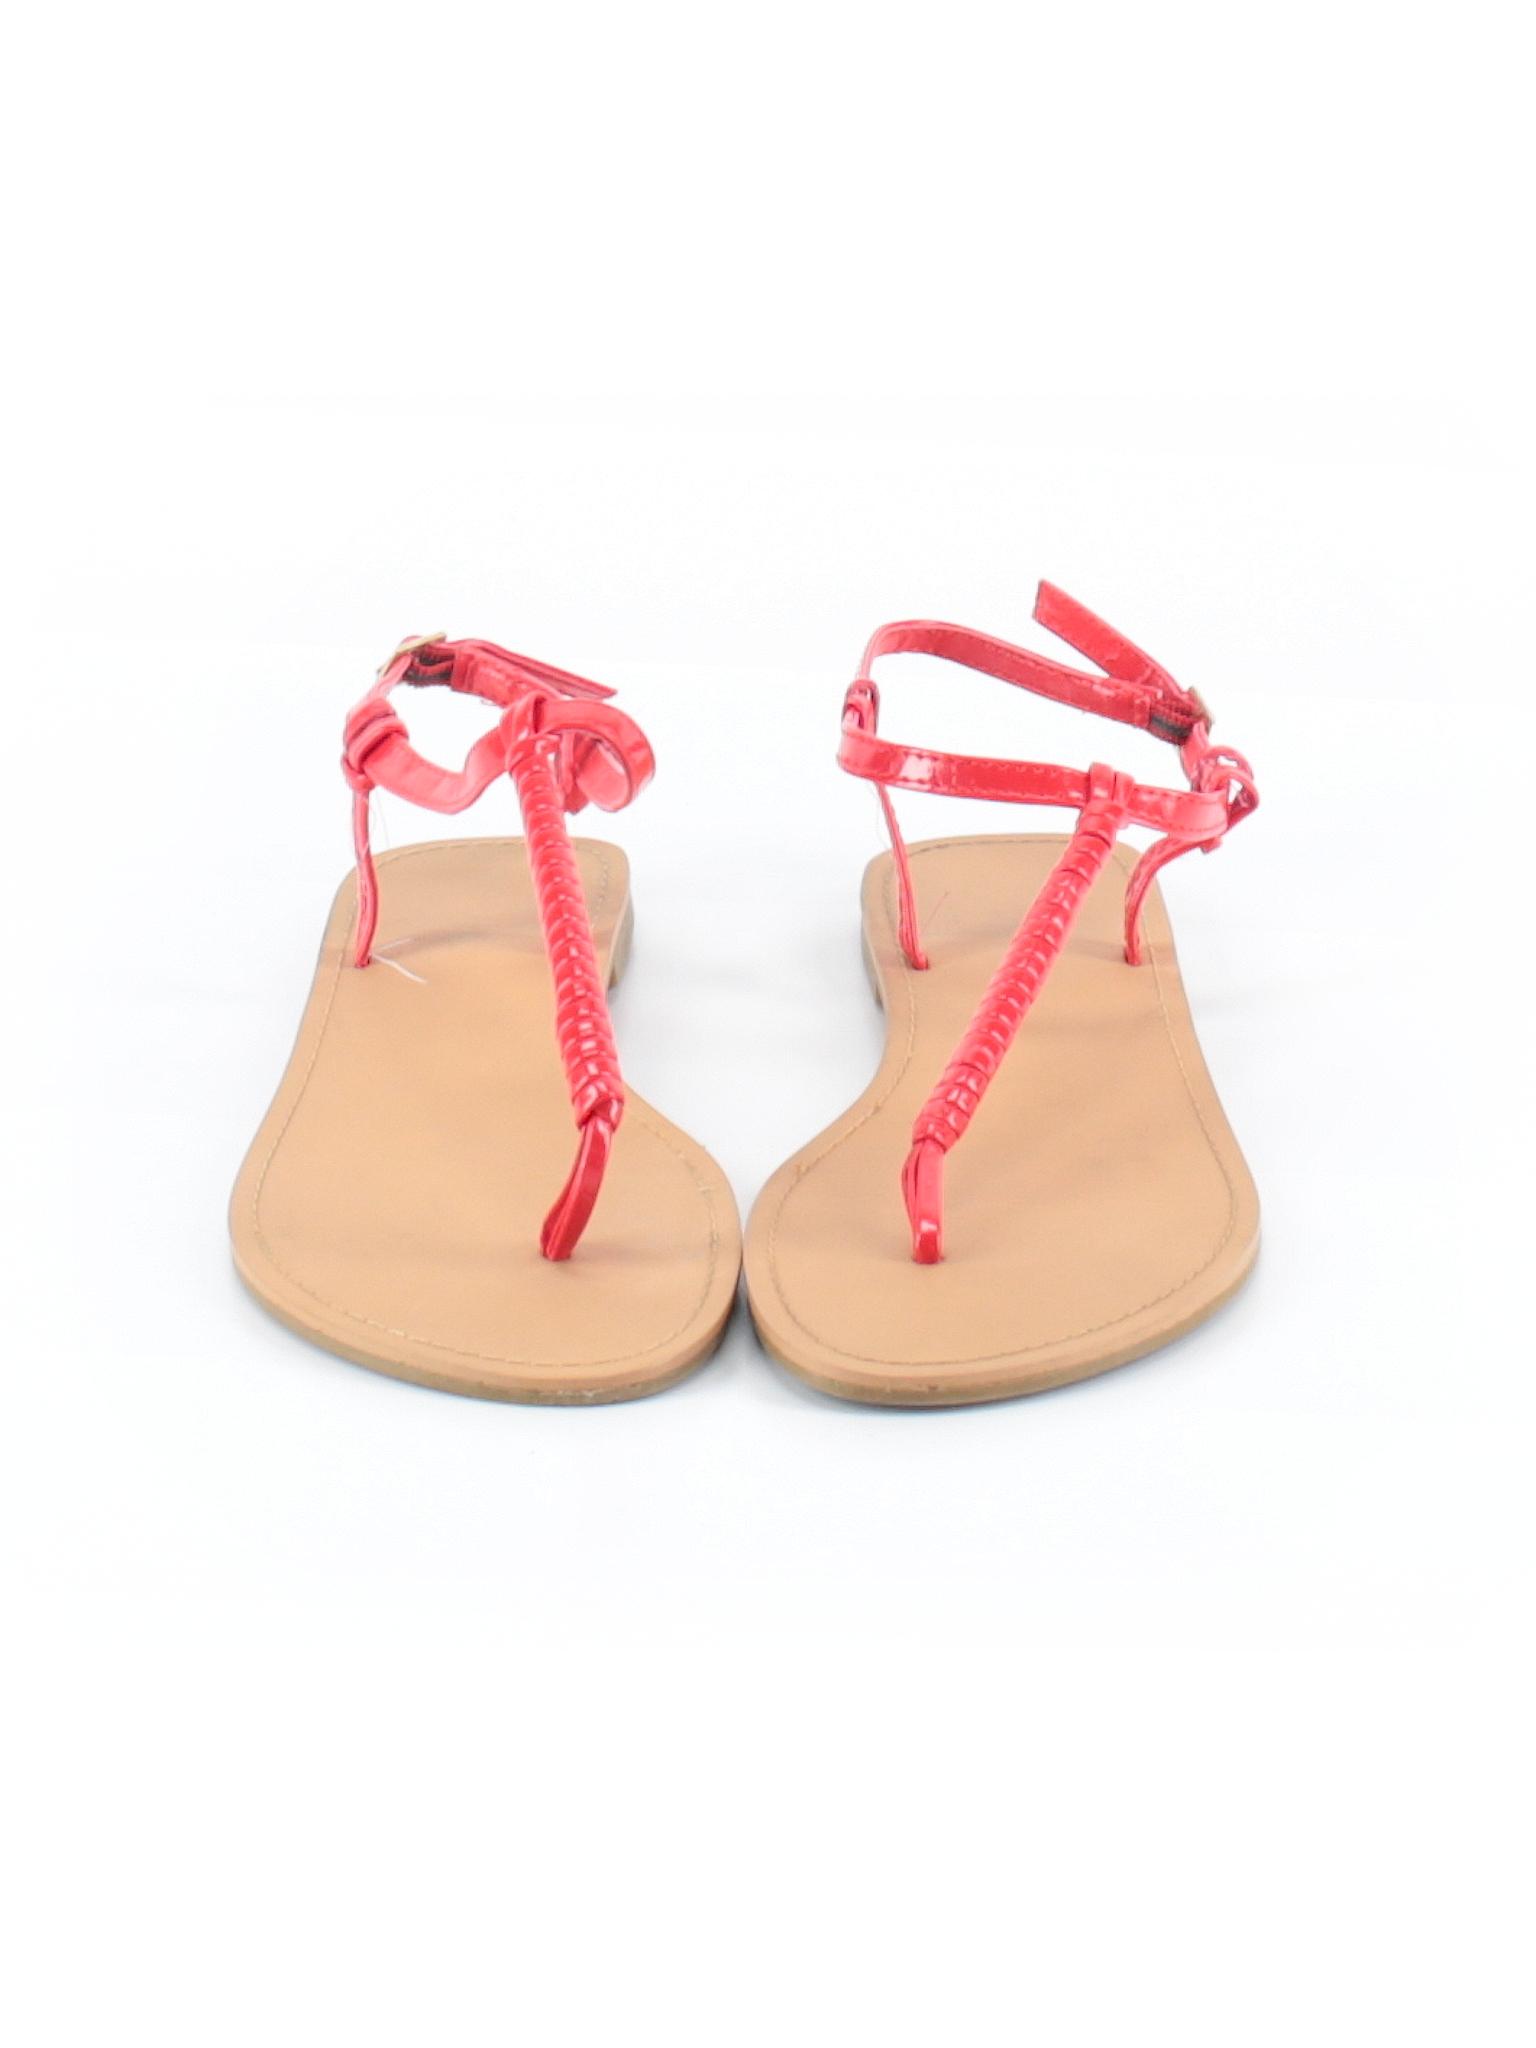 21 Sandals 21 Sandals Forever Boutique promotion Forever Boutique Boutique promotion 6PqP8pOx